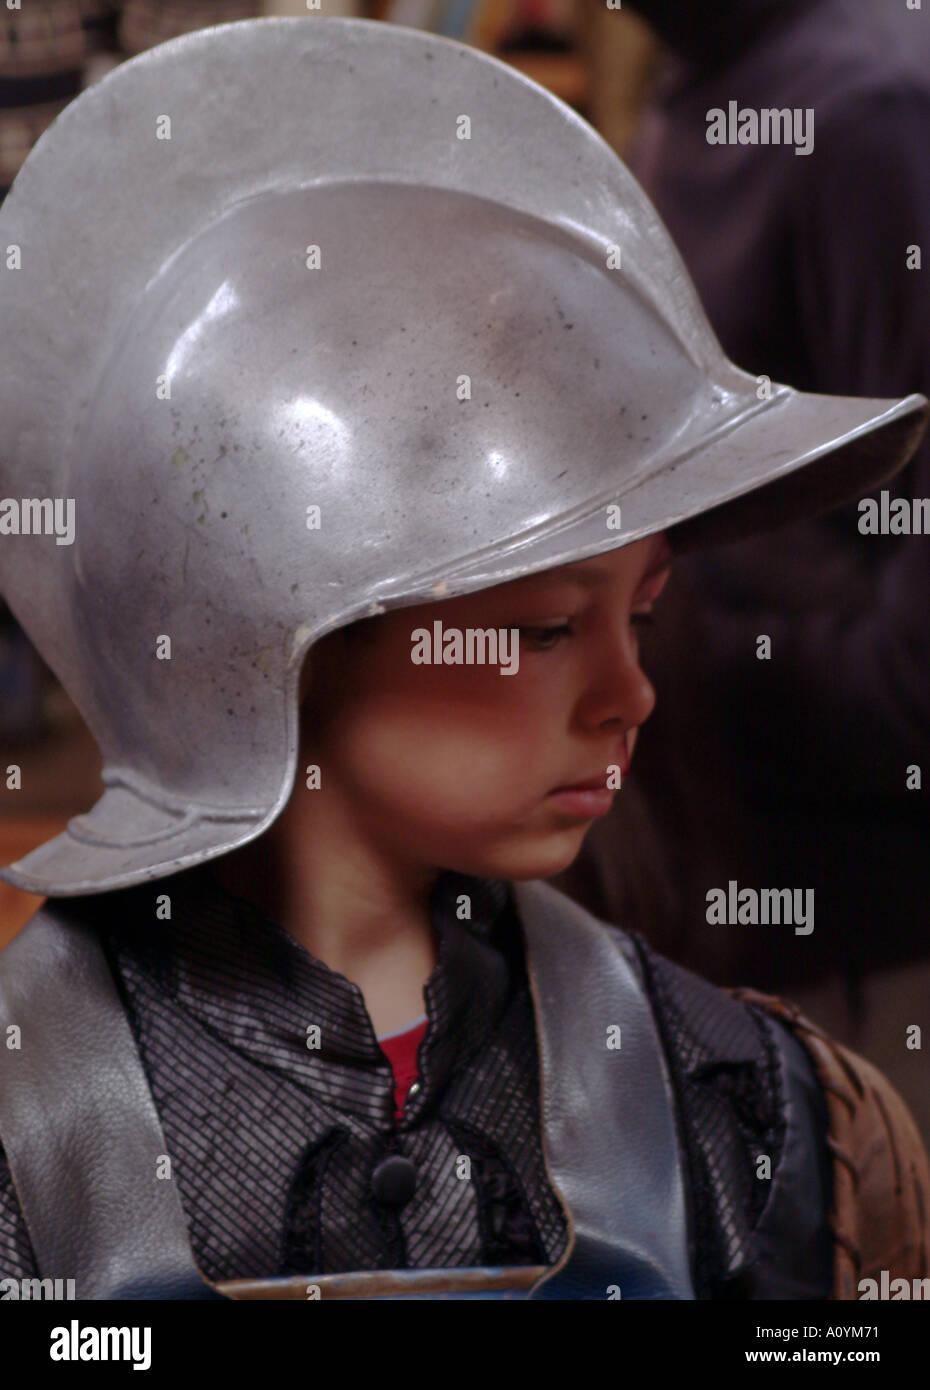 Small head big hat Stock Photo  3295344 - Alamy 738c59332cd